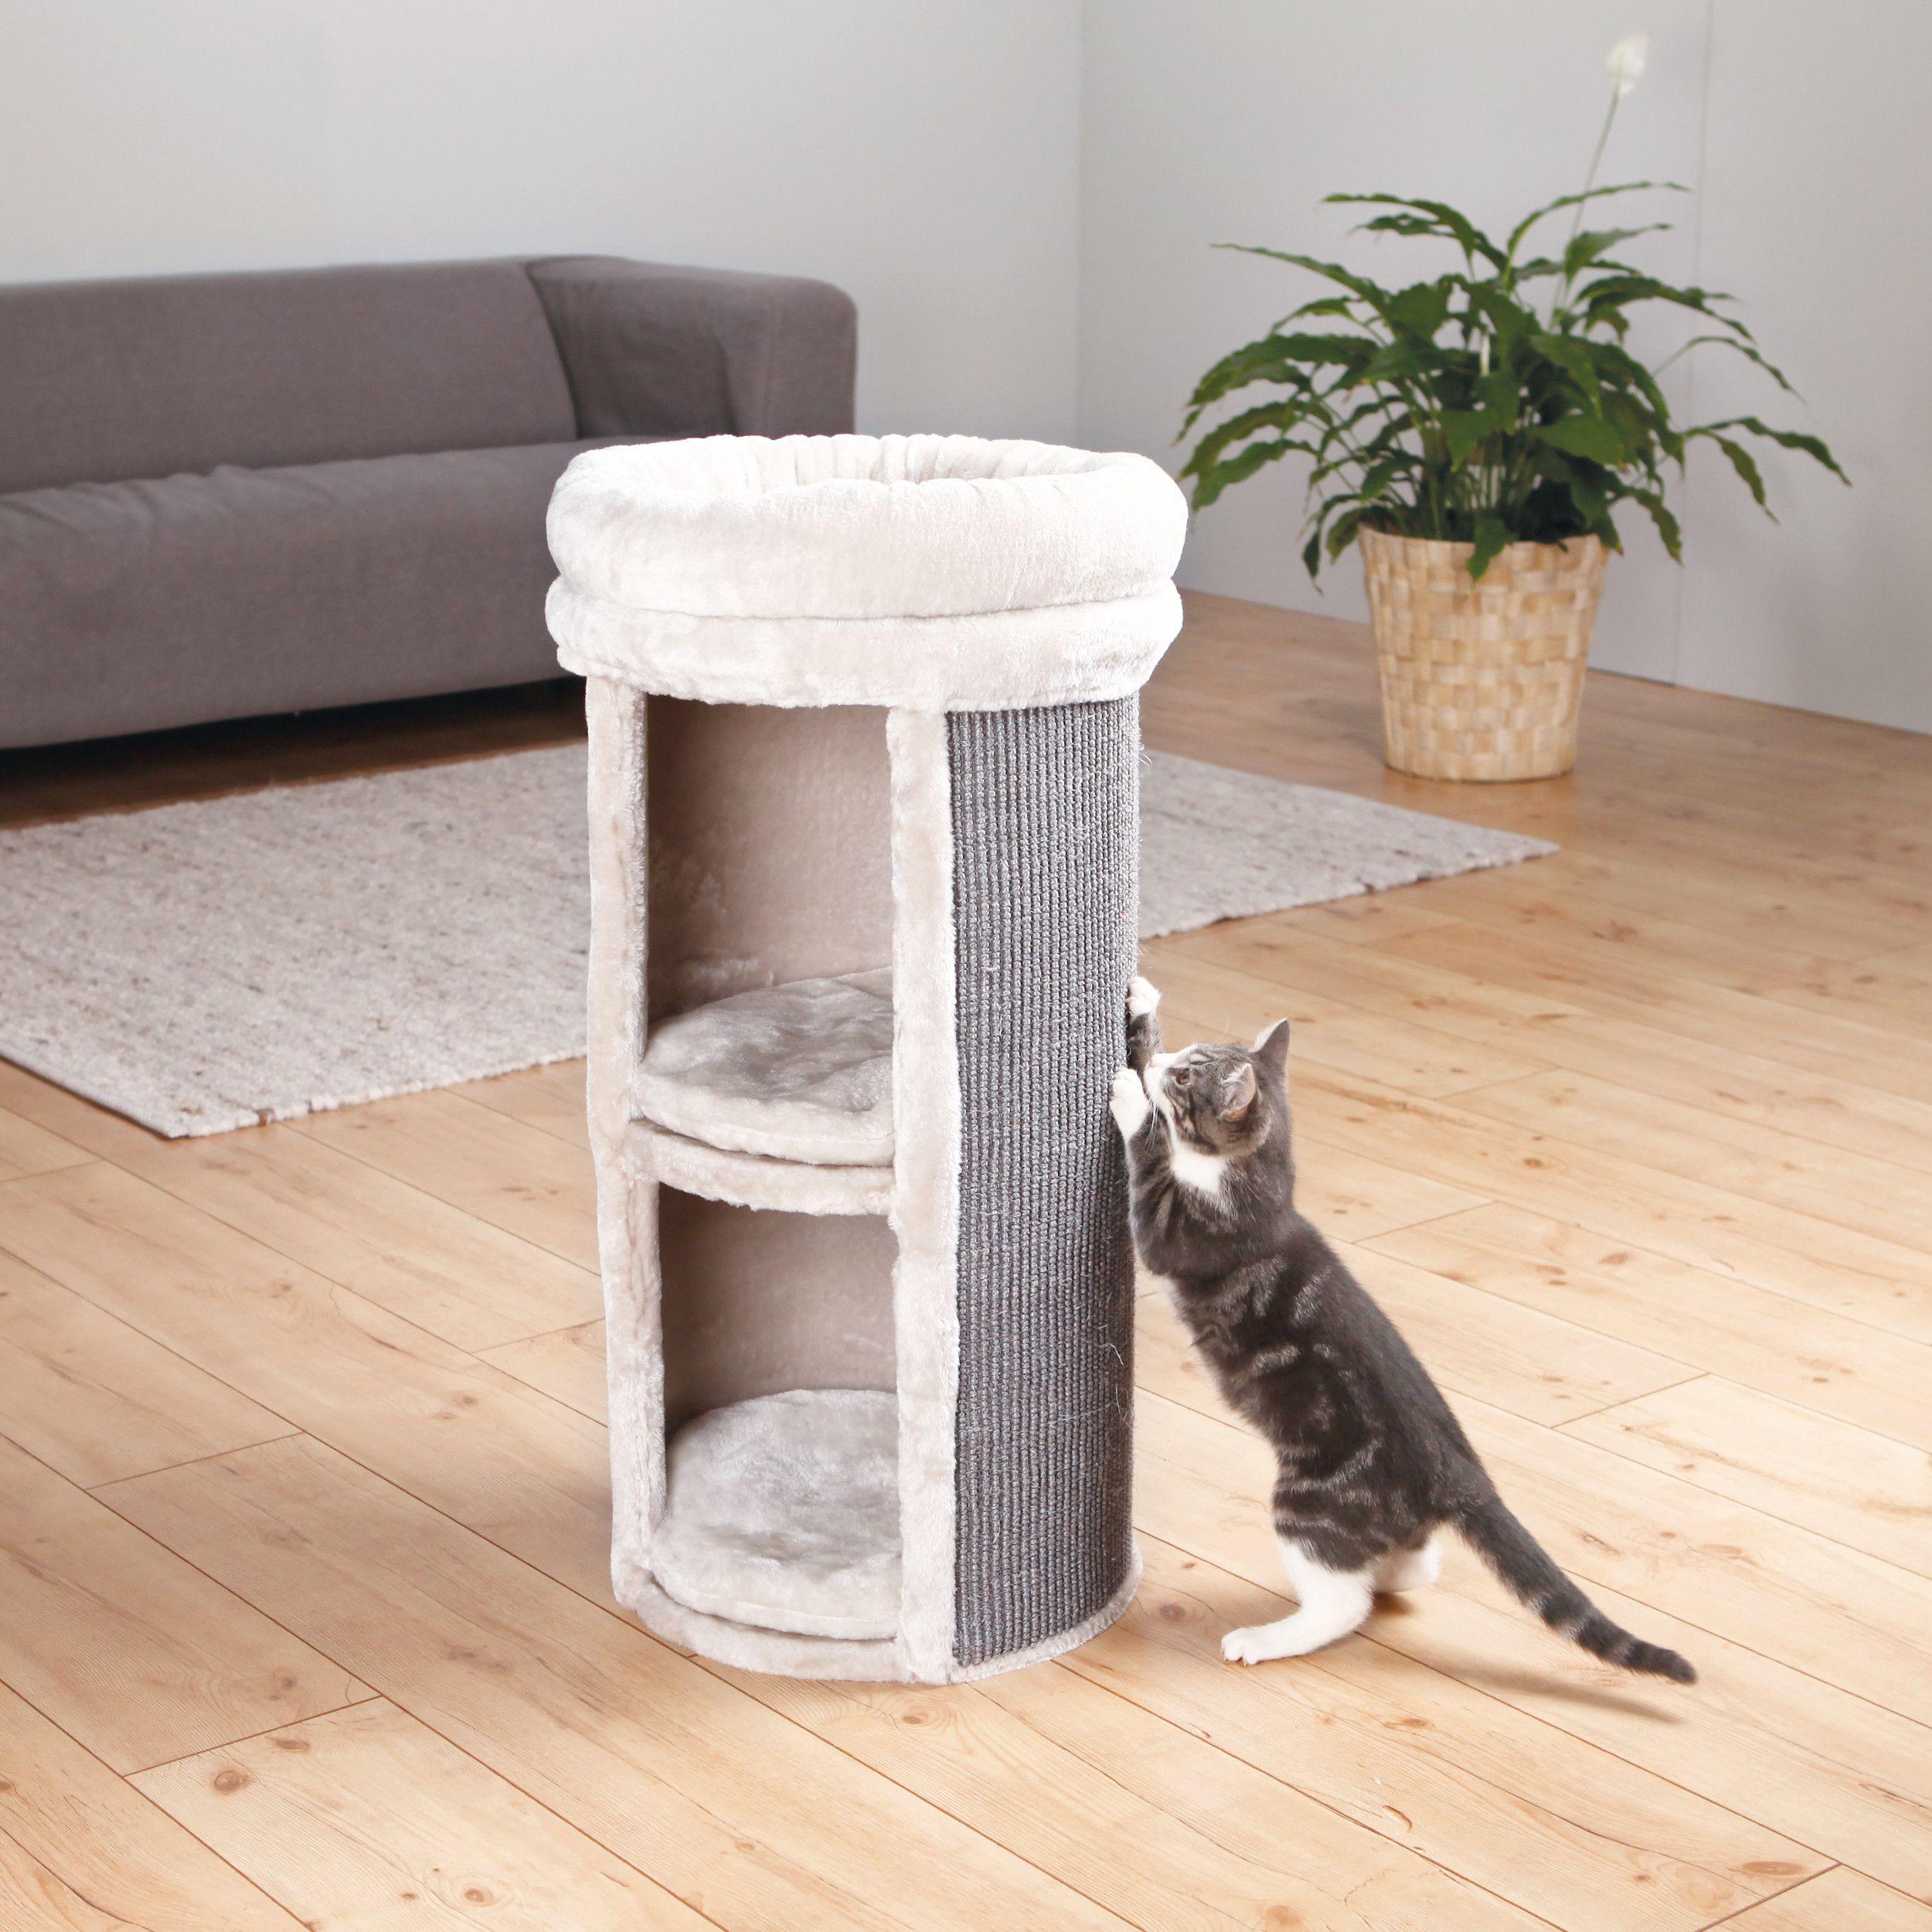 Trixie Mexia 2 Story Cat Tower Scratching Post Juegos Para Gatos Caseros Juegos Para Gatos Torres Para Gatos